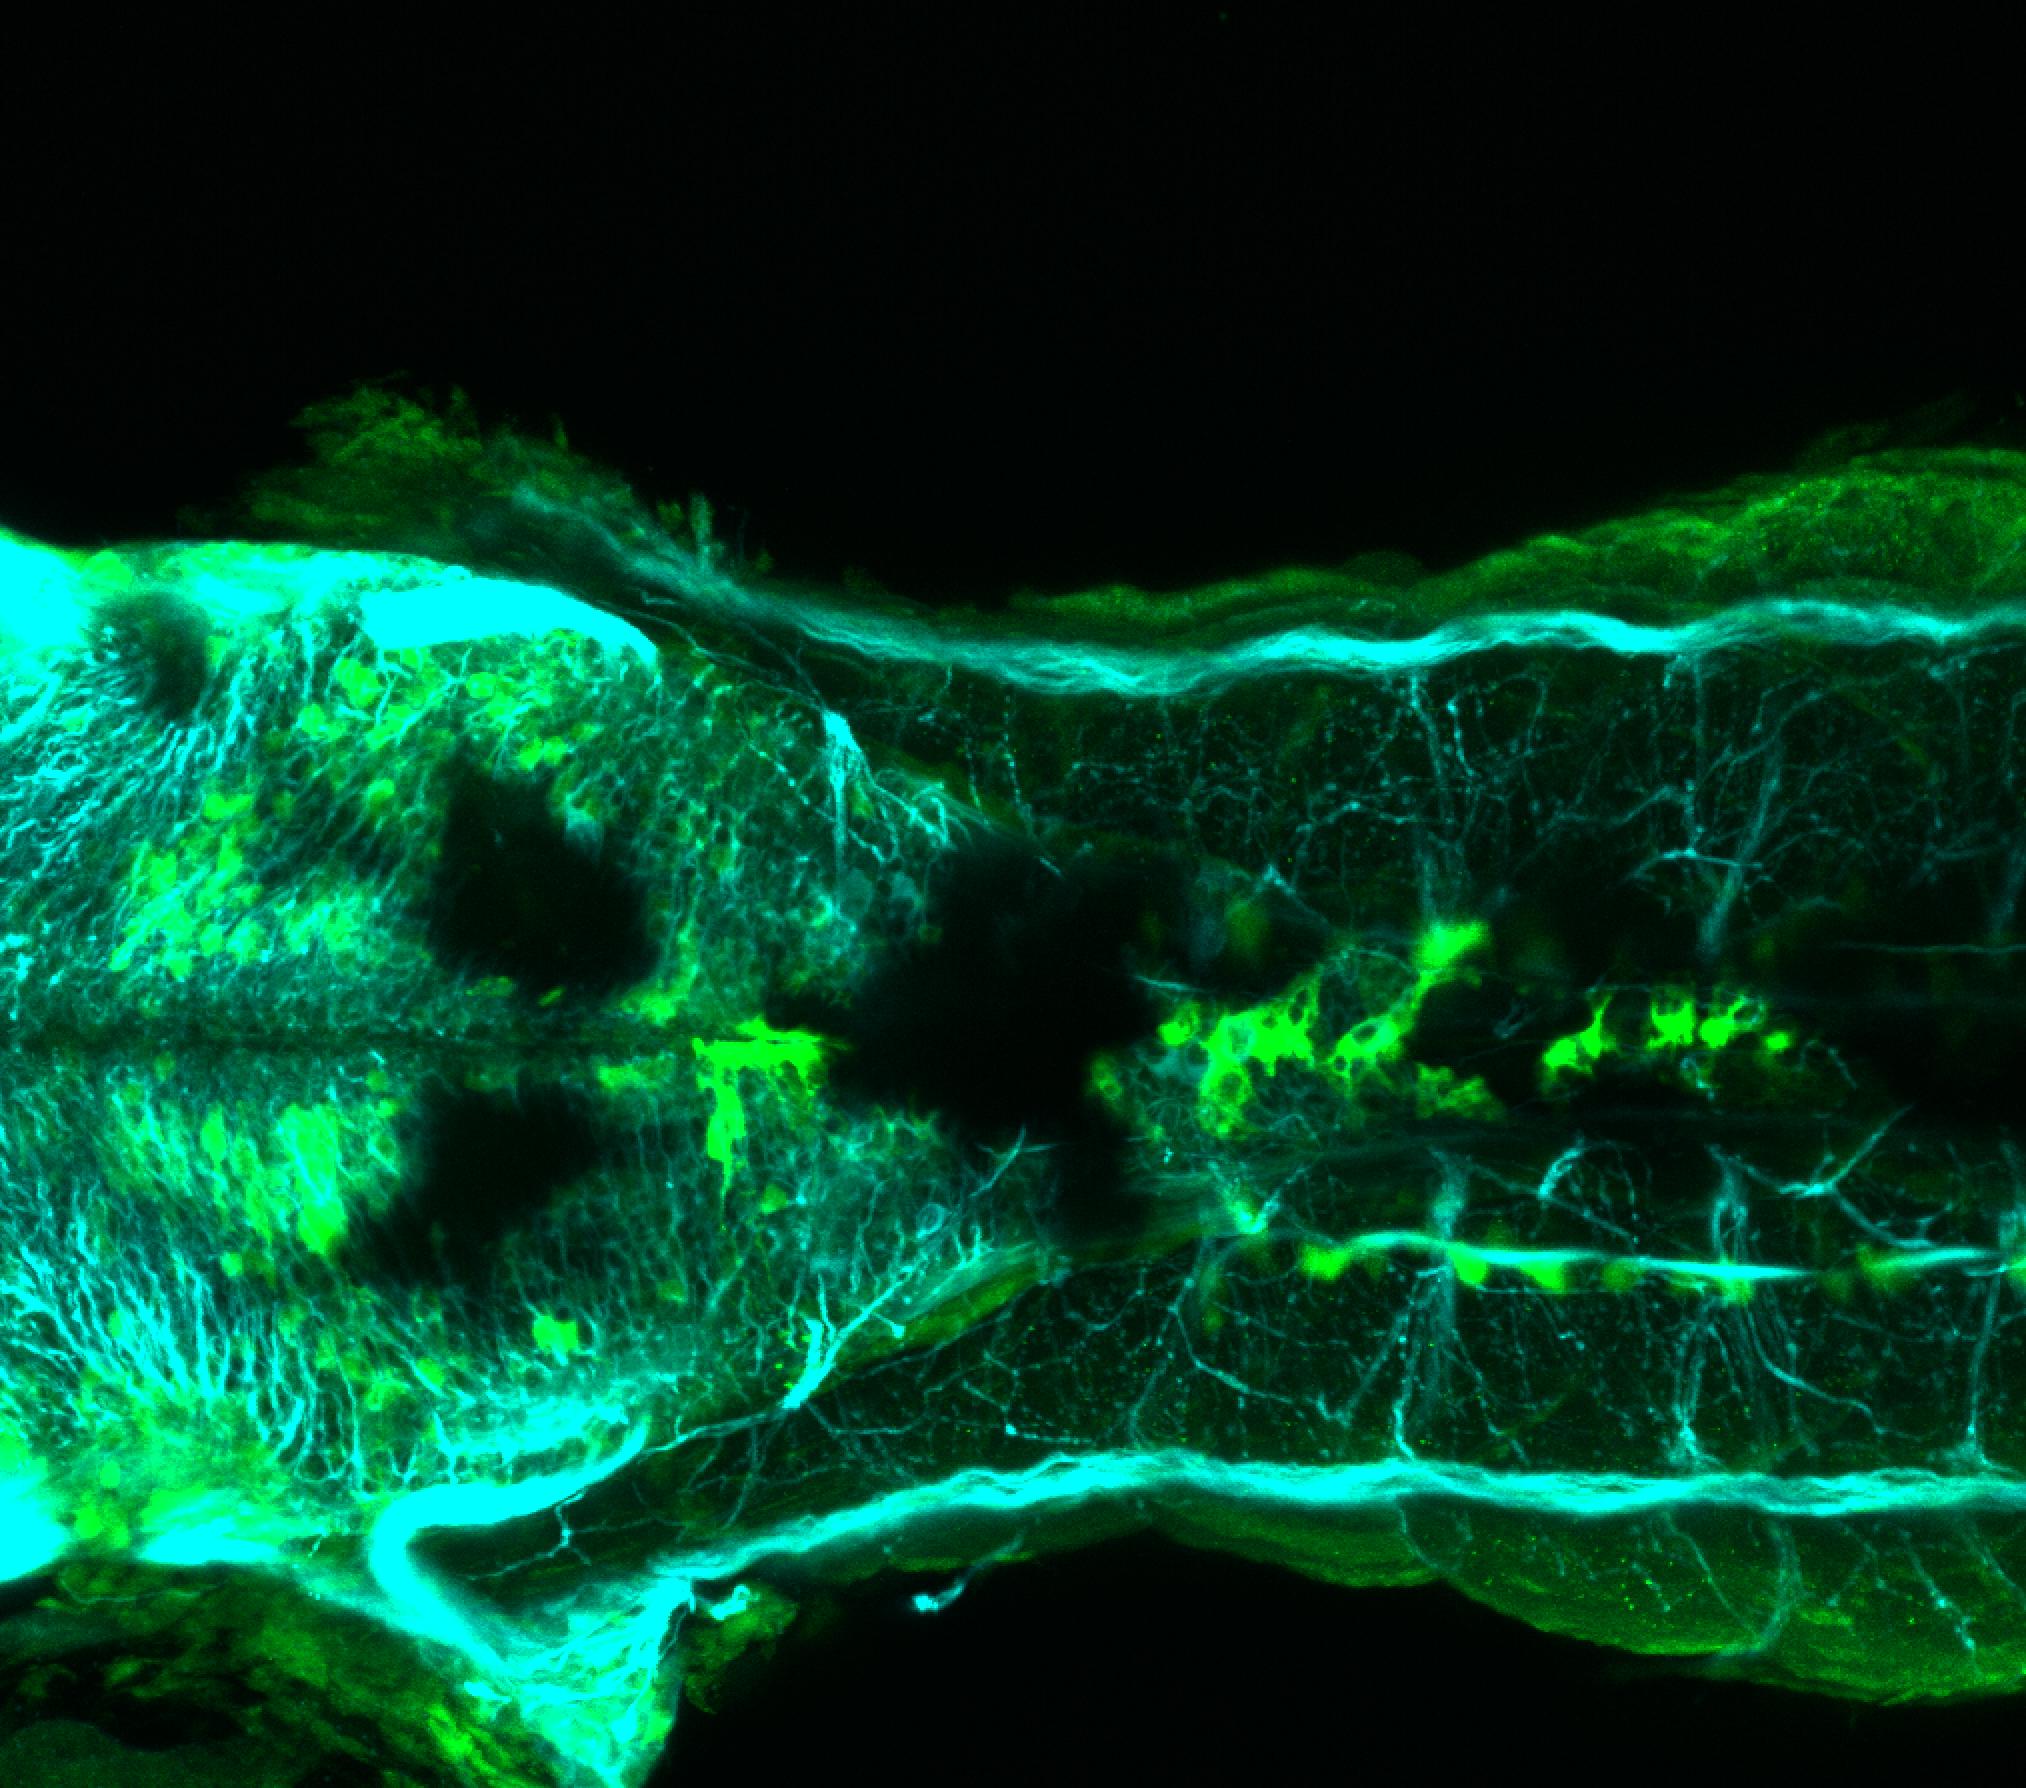 TG44:EGFP and tubulin dorsal view at 4dpf